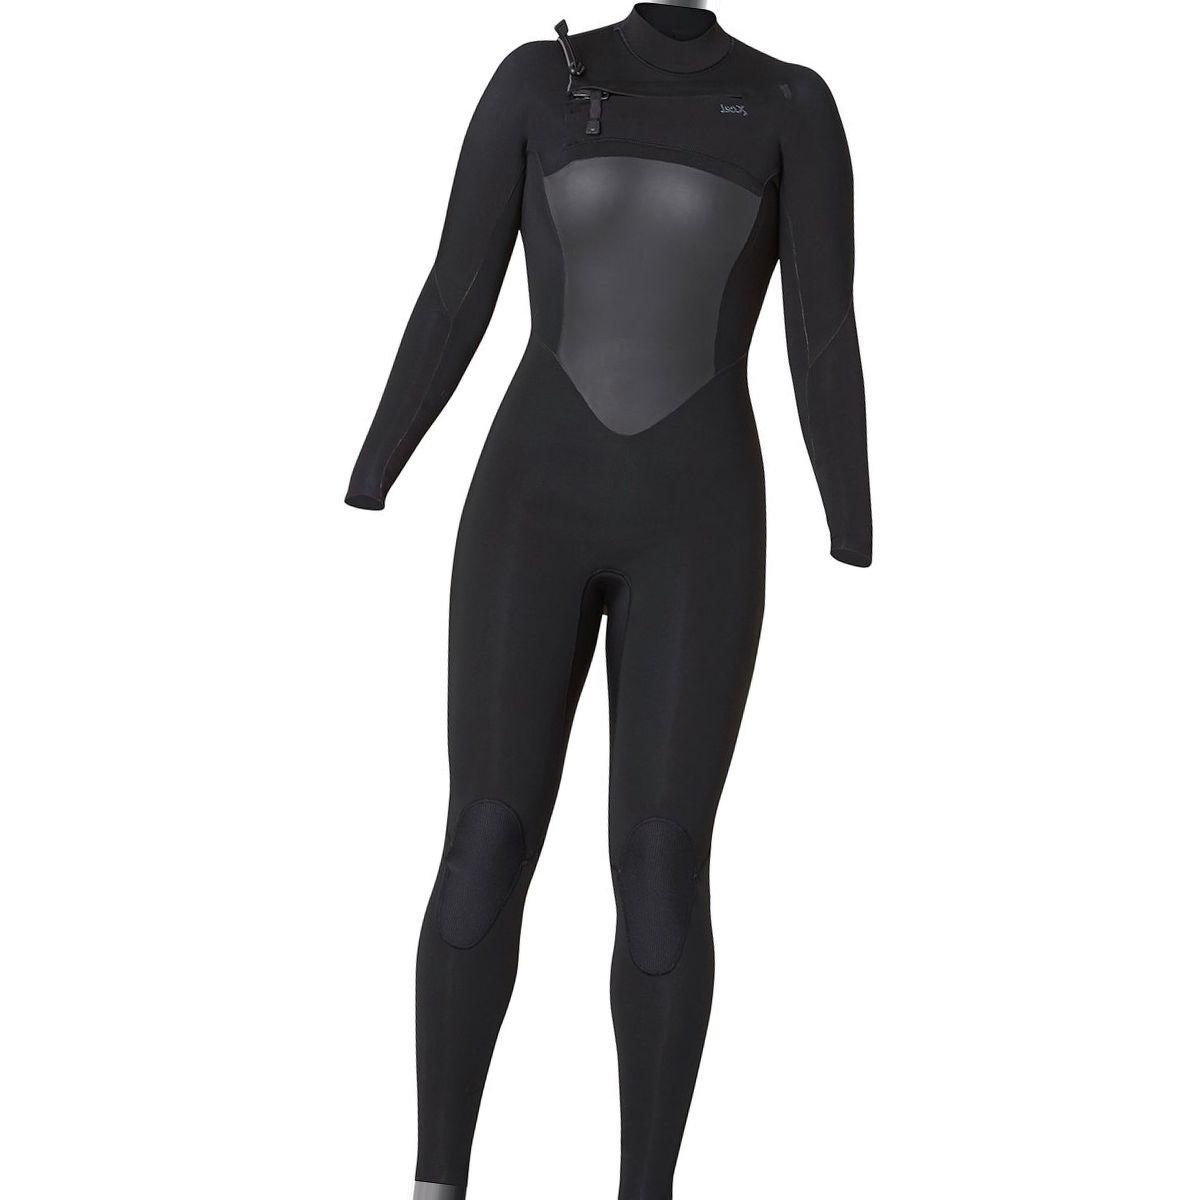 XCEL Infiniti 3/2 Wetsuit - Women's